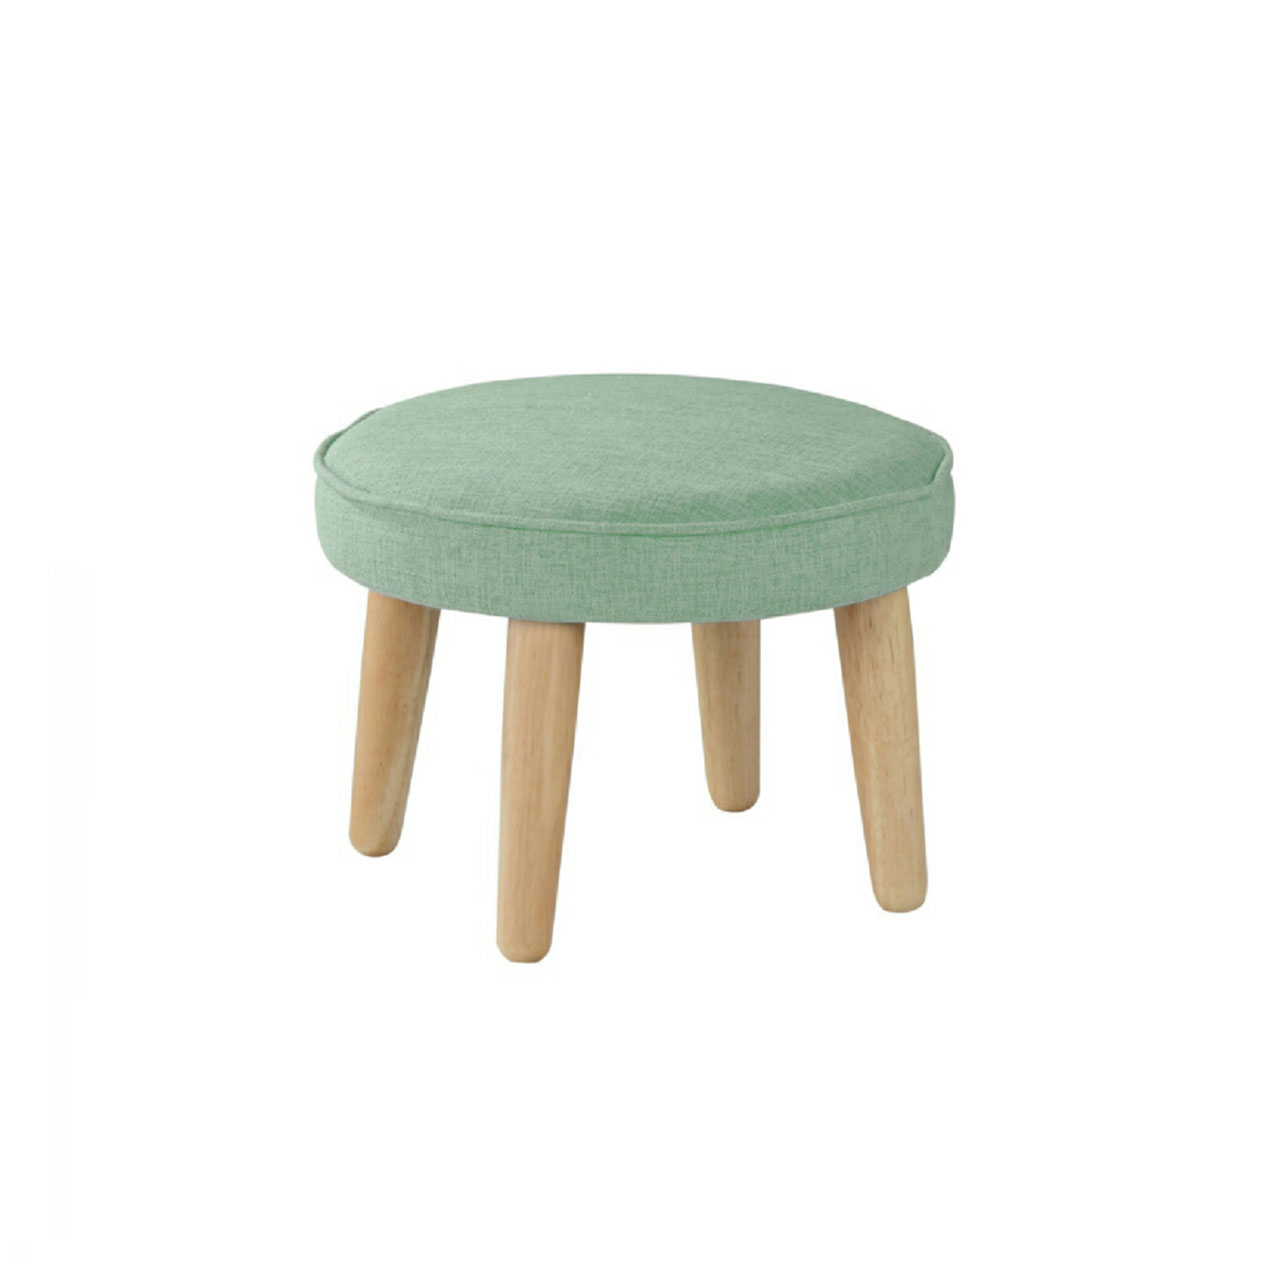 stool chair ph blue ridge works ophelia furniture store manila philippines urban